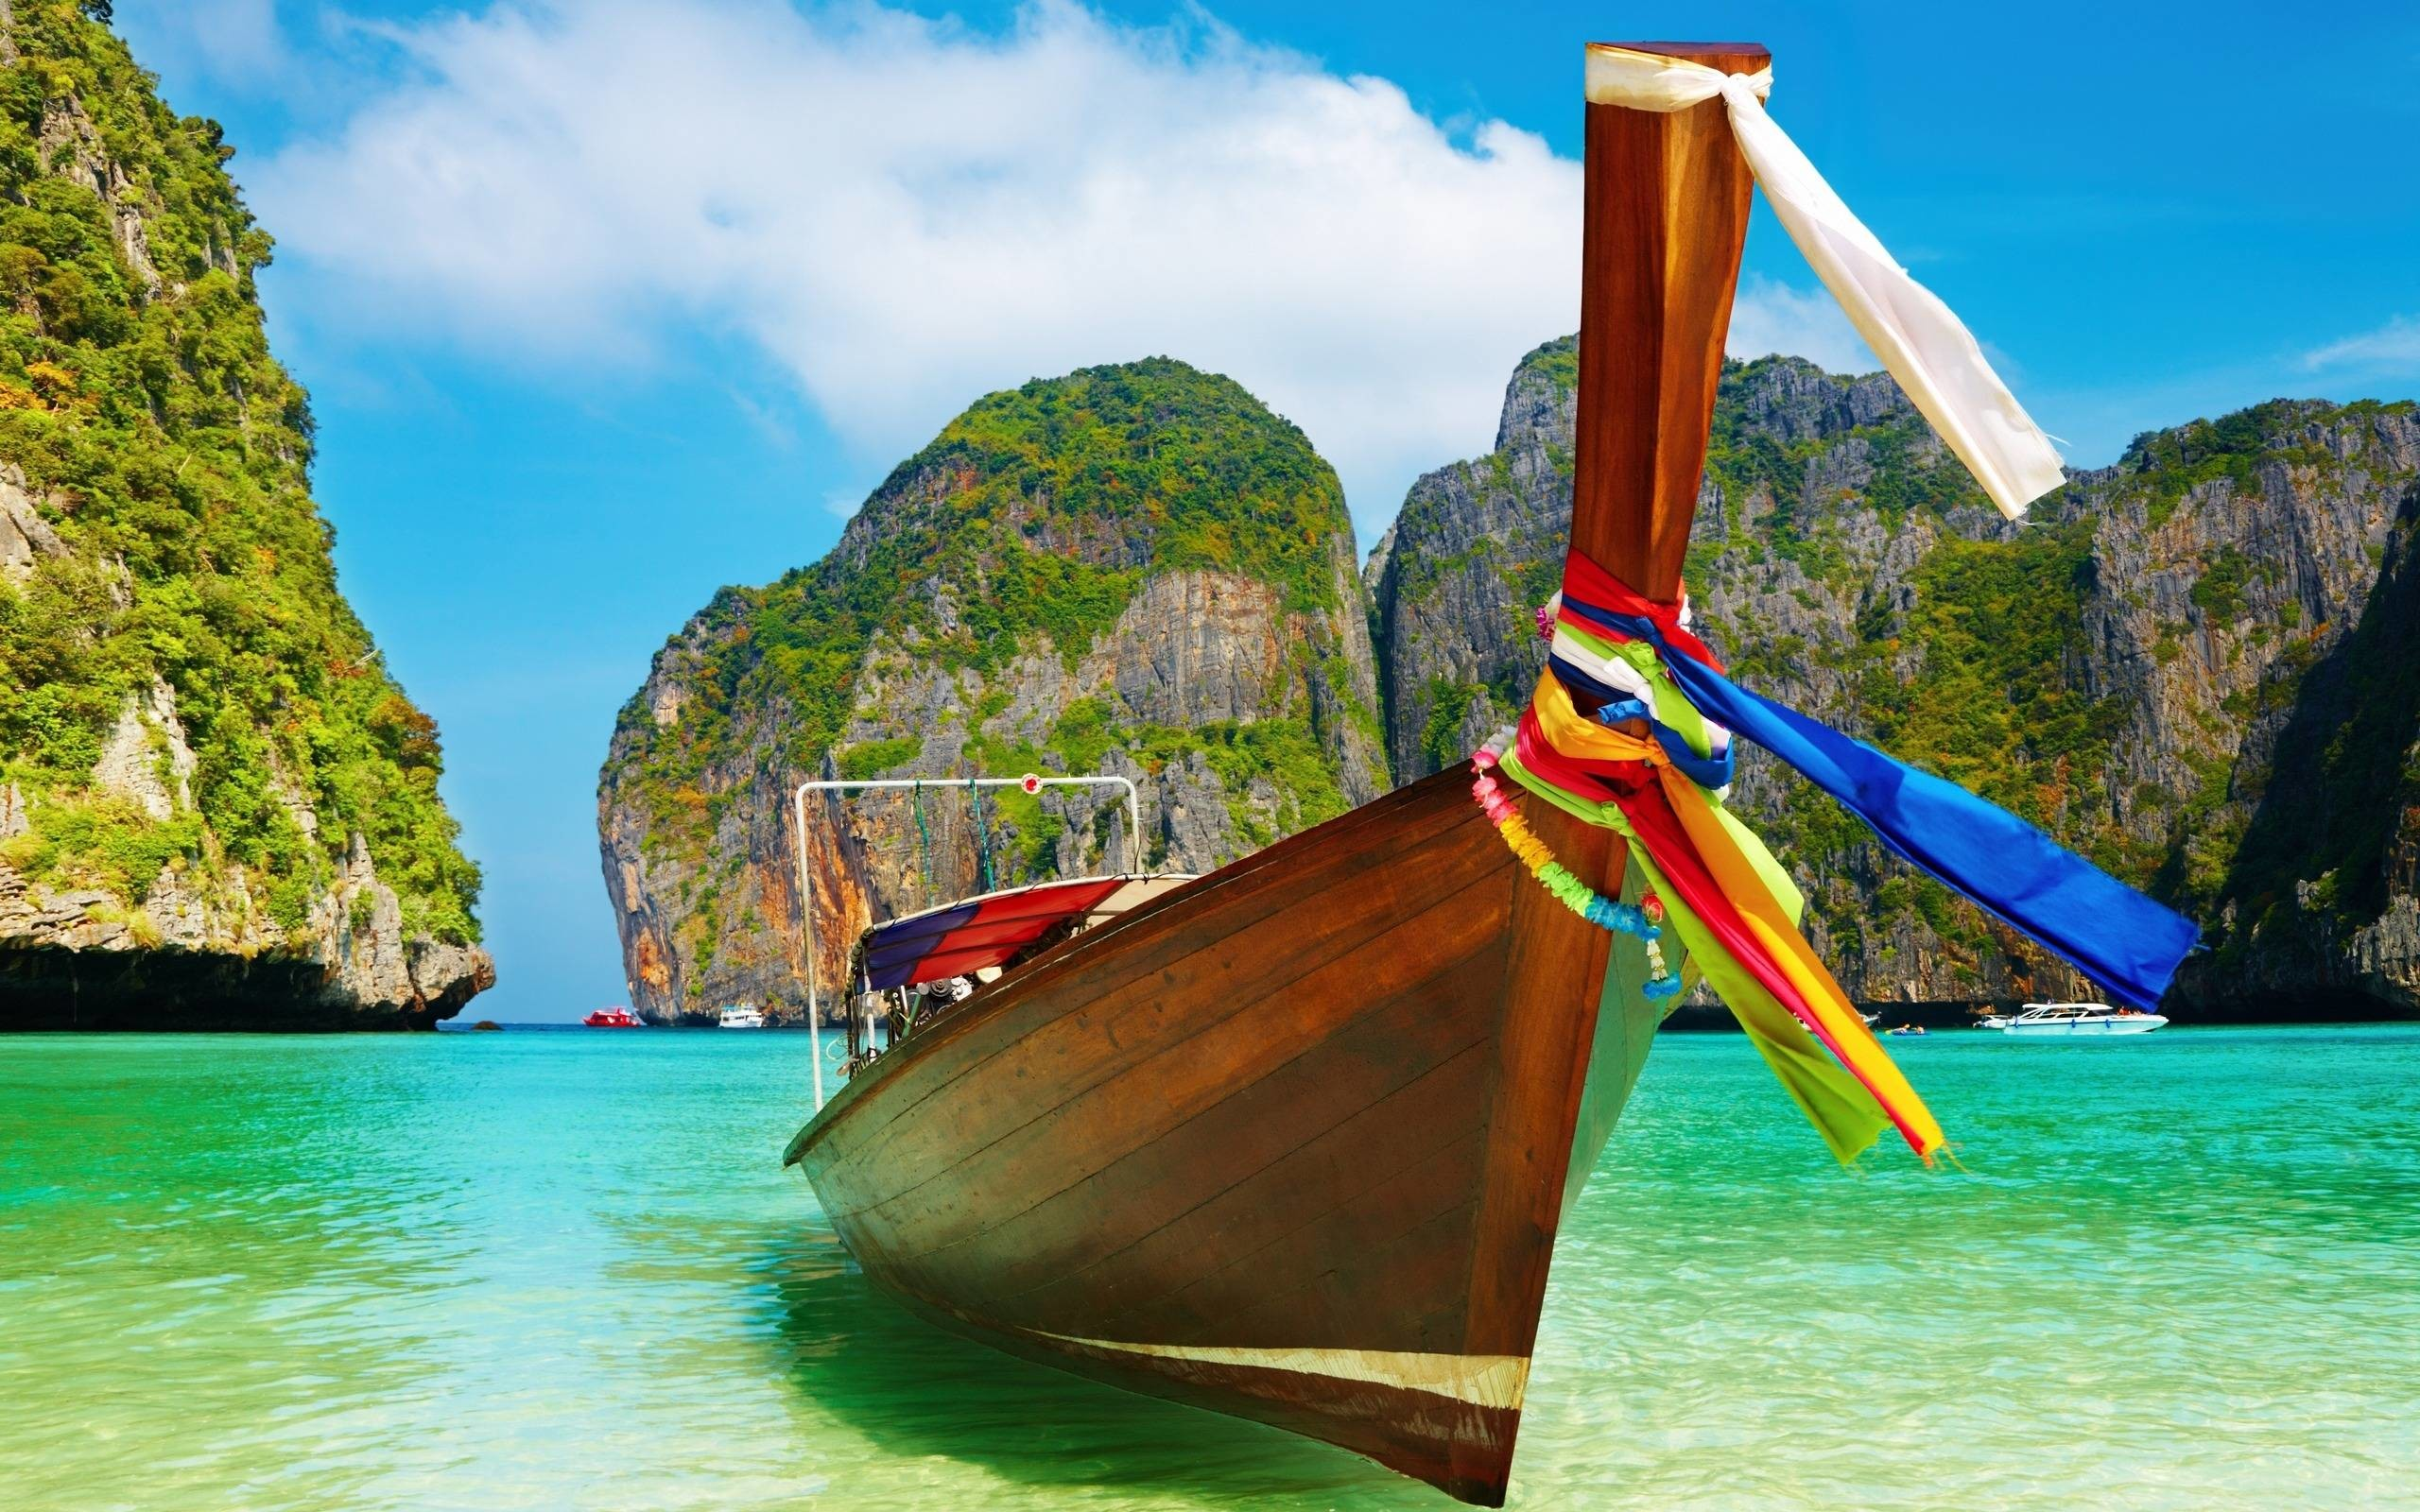 Sailboat Holiday Summer 4k Hd Desktop Wallpaper For 4k: Summer Wallpaper Screensavers (58+ Images